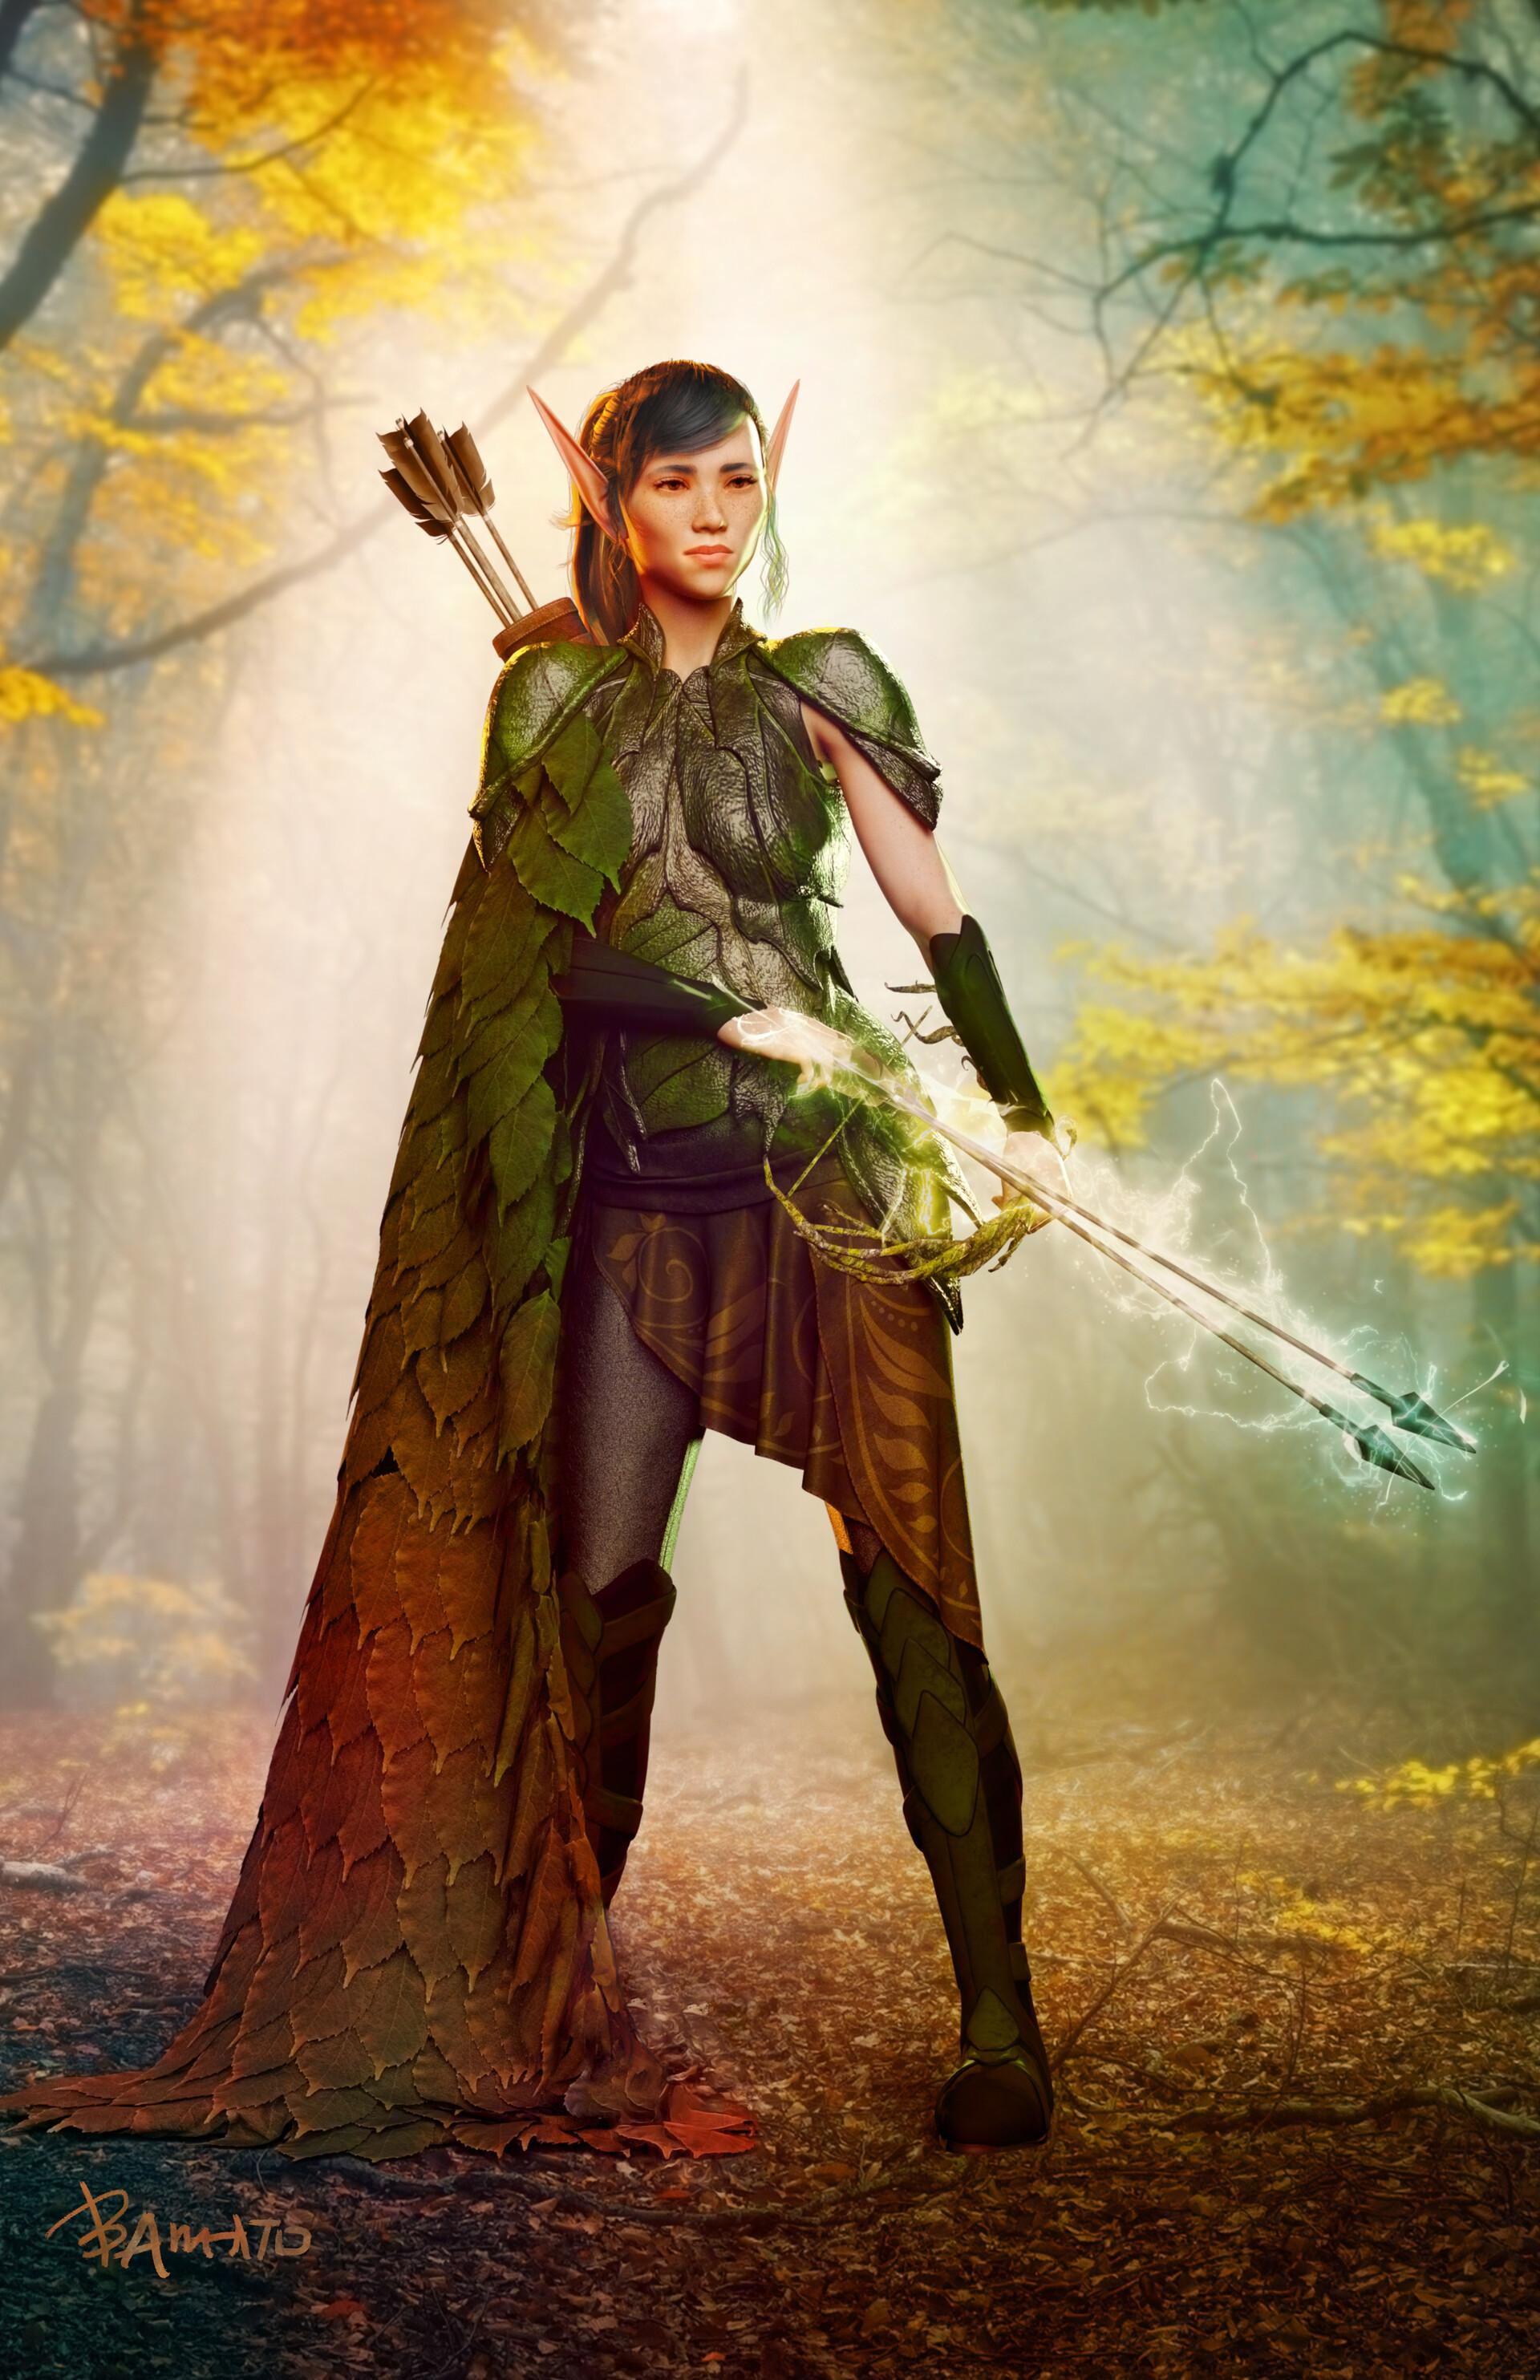 Benni a woodelfarcanearcher